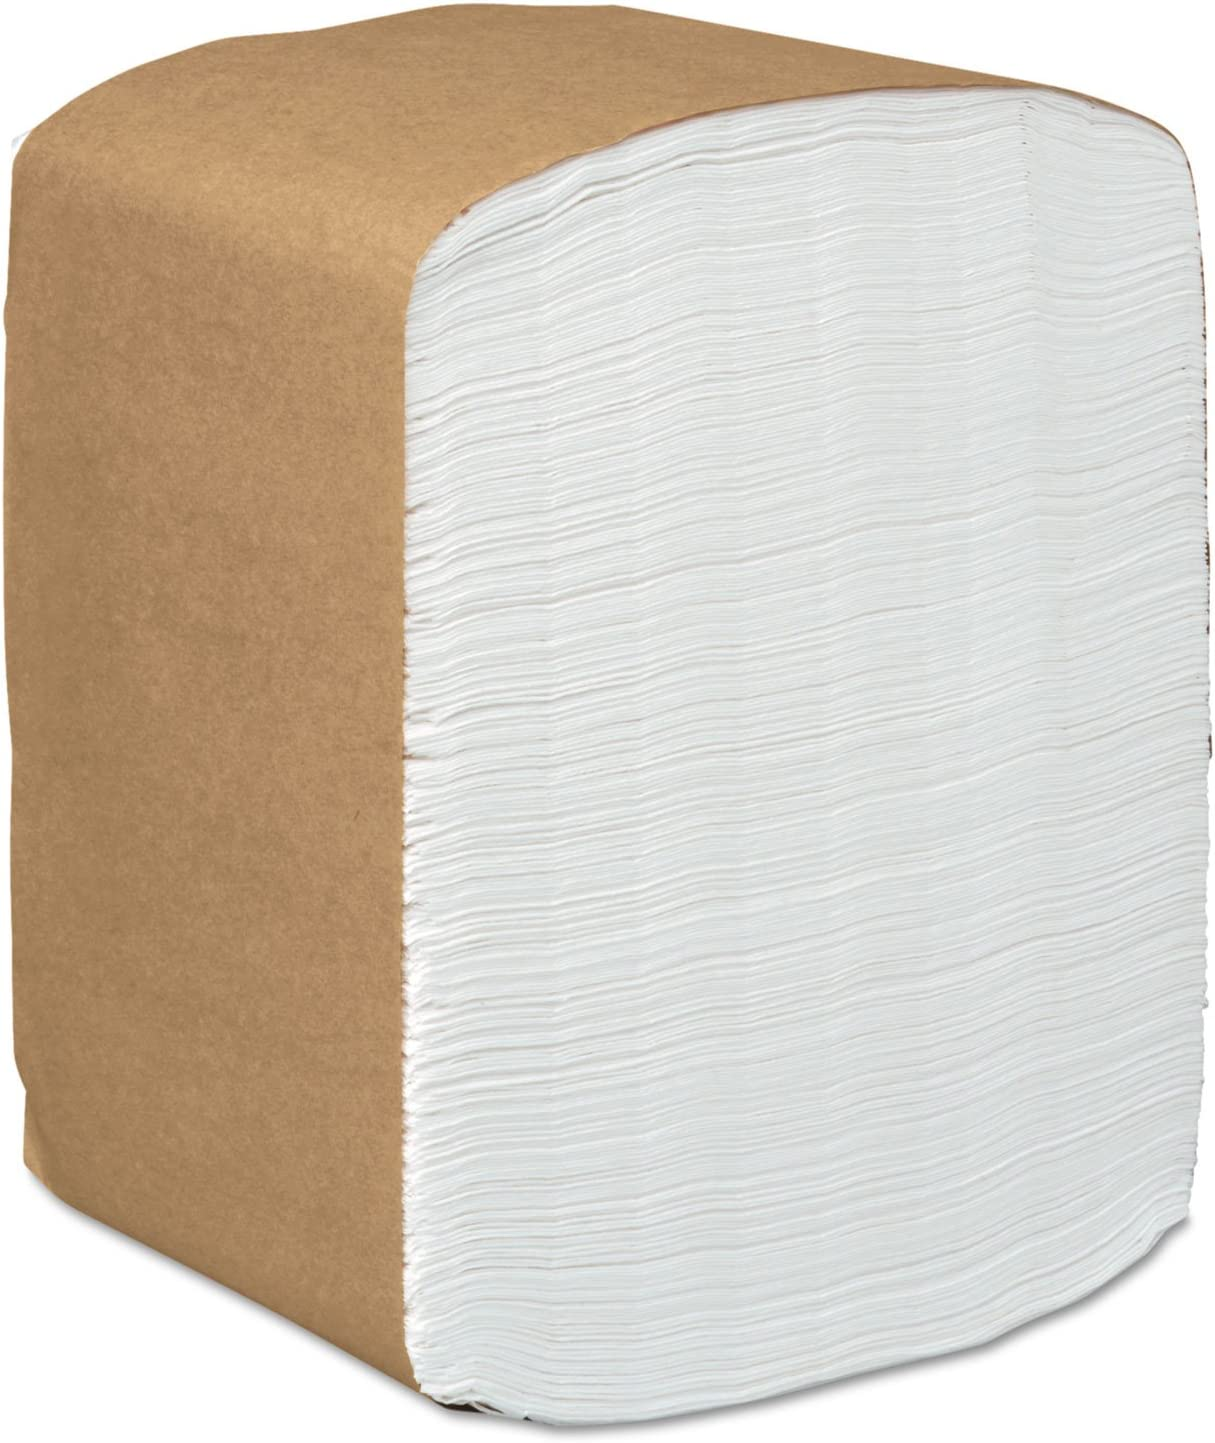 35% OFF Scott 98730 Full-Fold Dispenser Napkins Free shipping anywhere in the nation White x 17 12 1-Ply